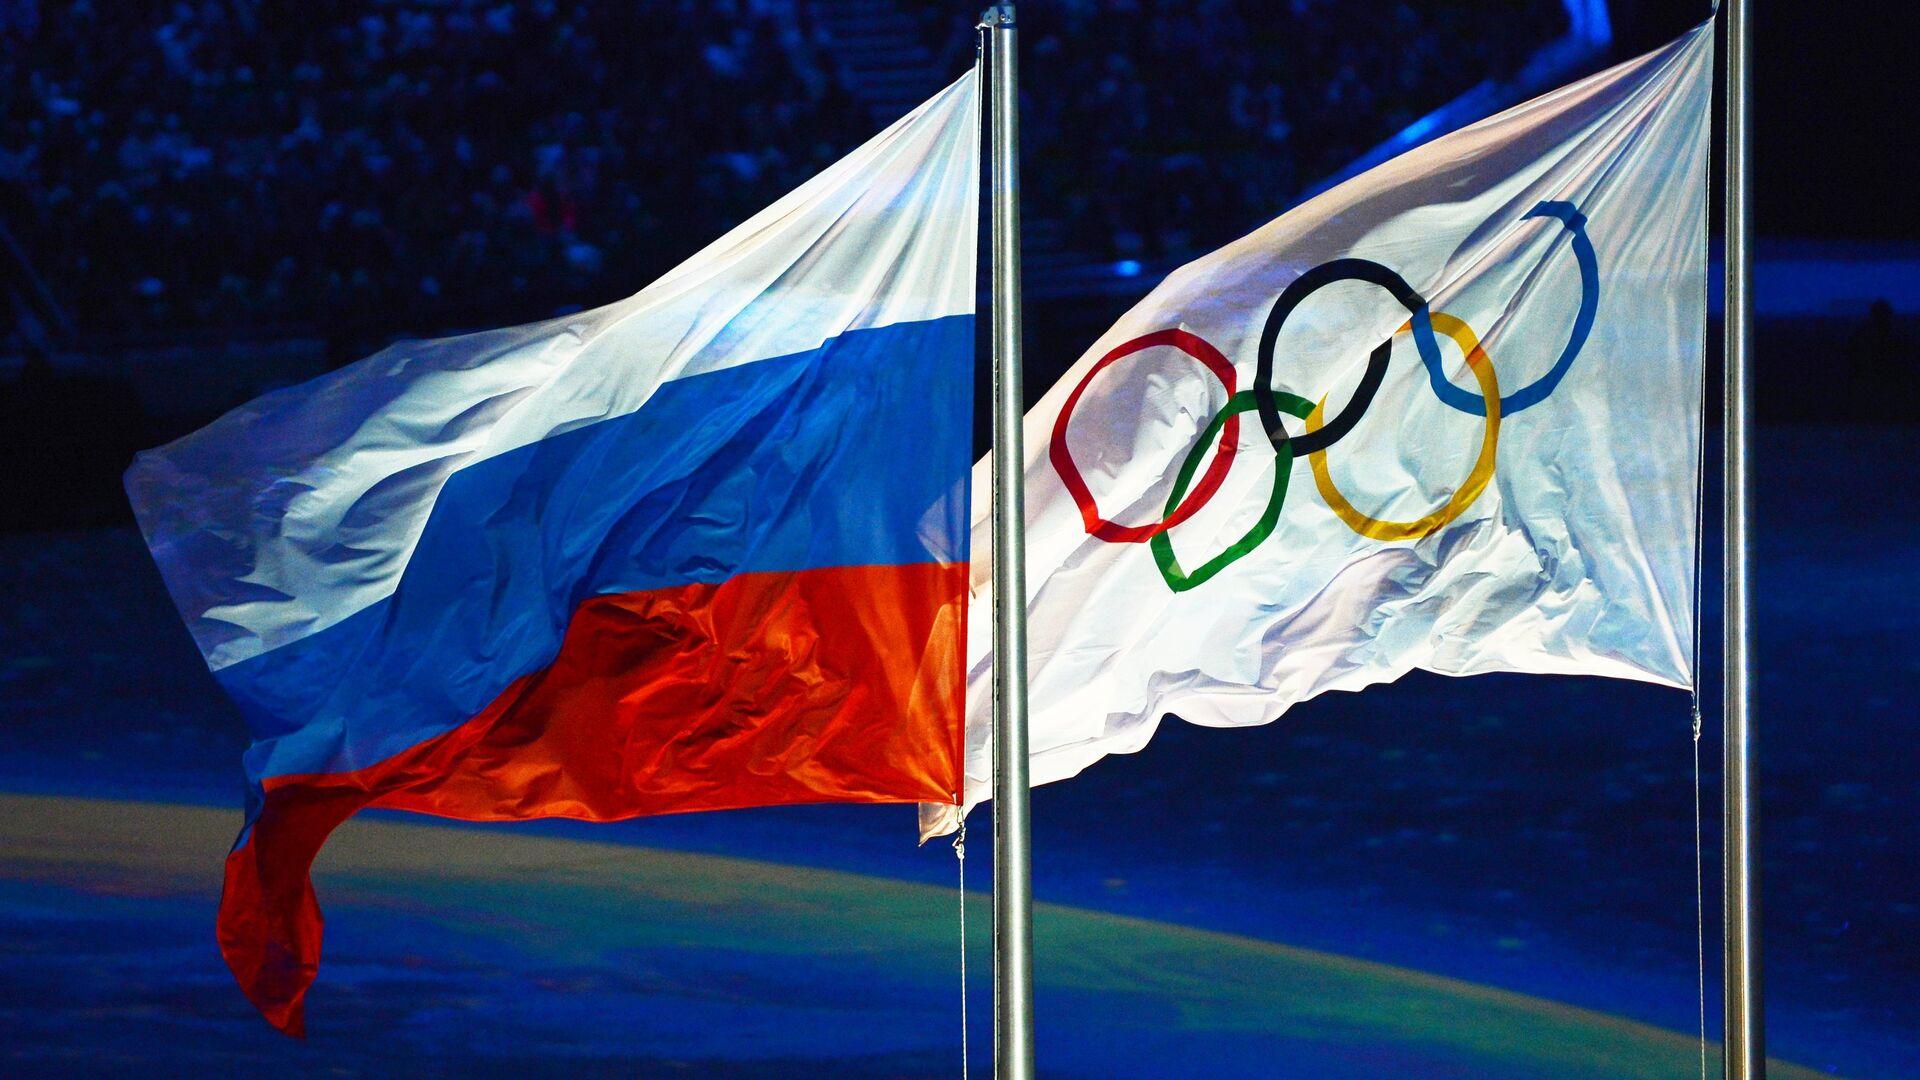 Олимпийский флаг и флаг России - РИА Новости, 1920, 31.07.2021